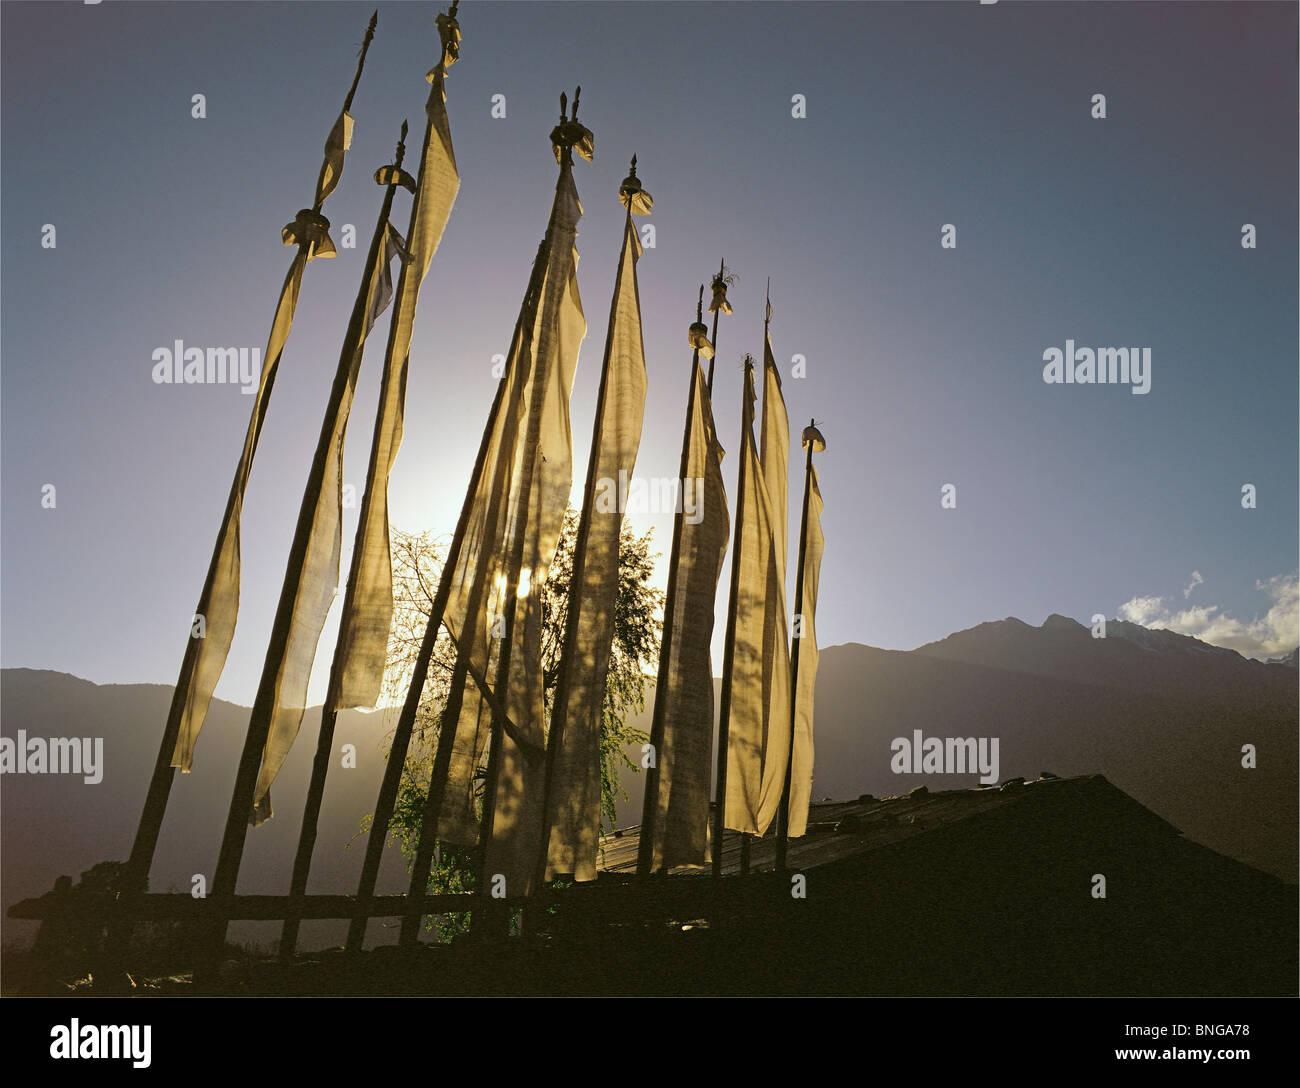 Prayerflags at Shermatang in the Helambu region of central Nepal - Stock Image